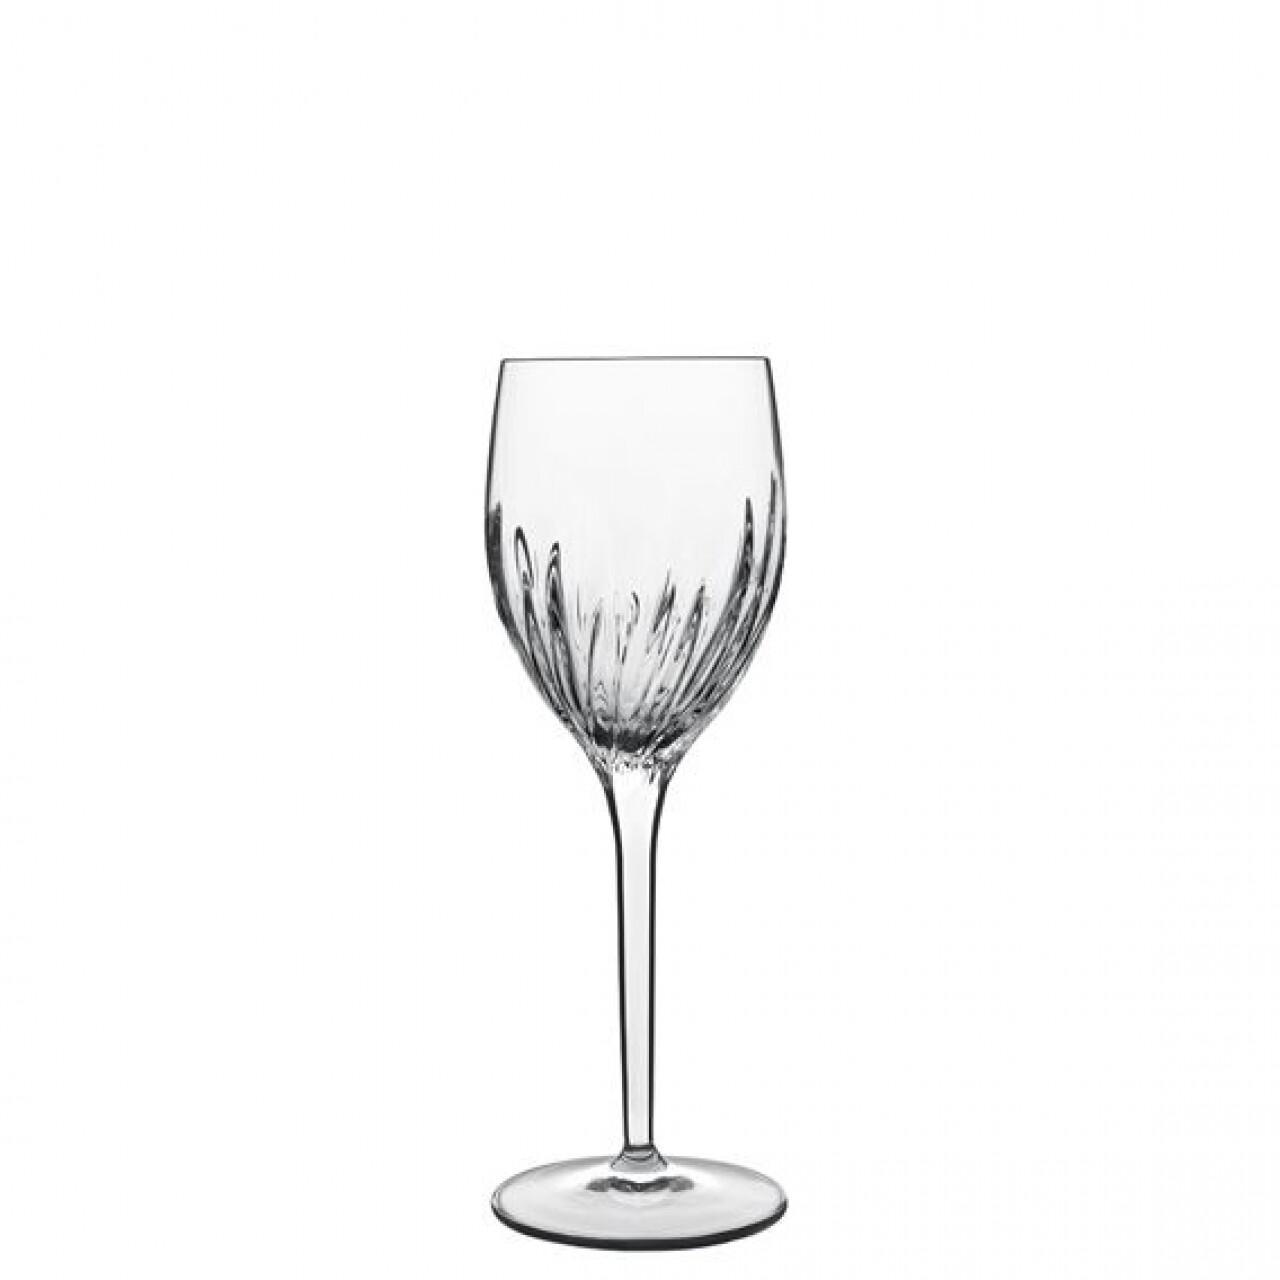 Set 6 pahare vin alb Incanto, Luigi Bormioli, 266 ml, cristalit, transparent